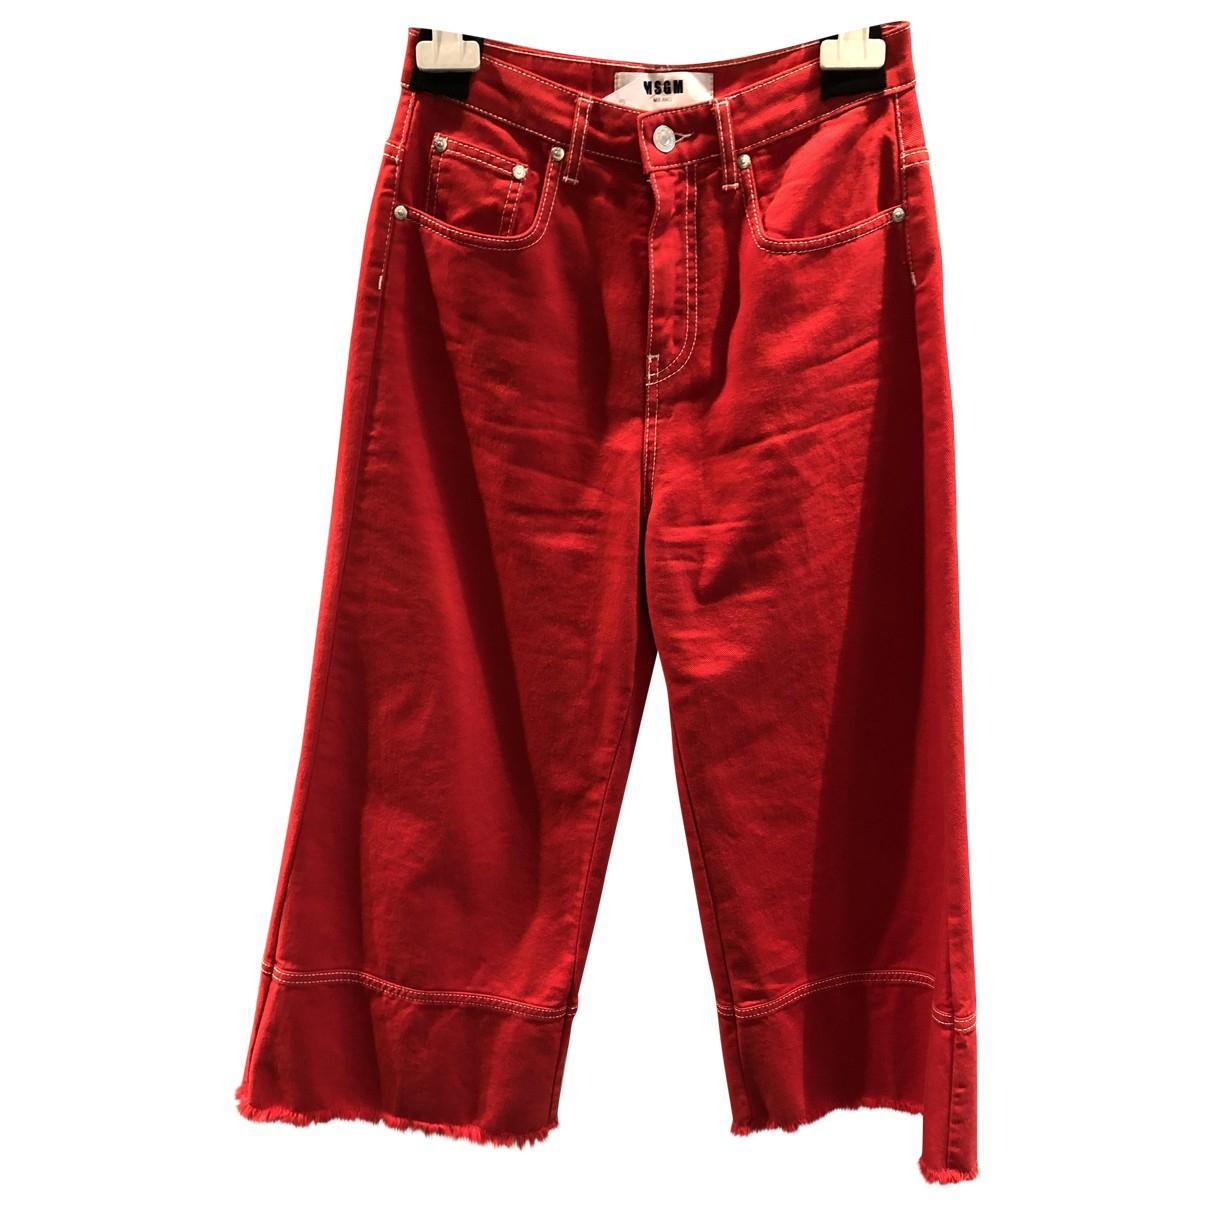 Pantalon corto Msgm